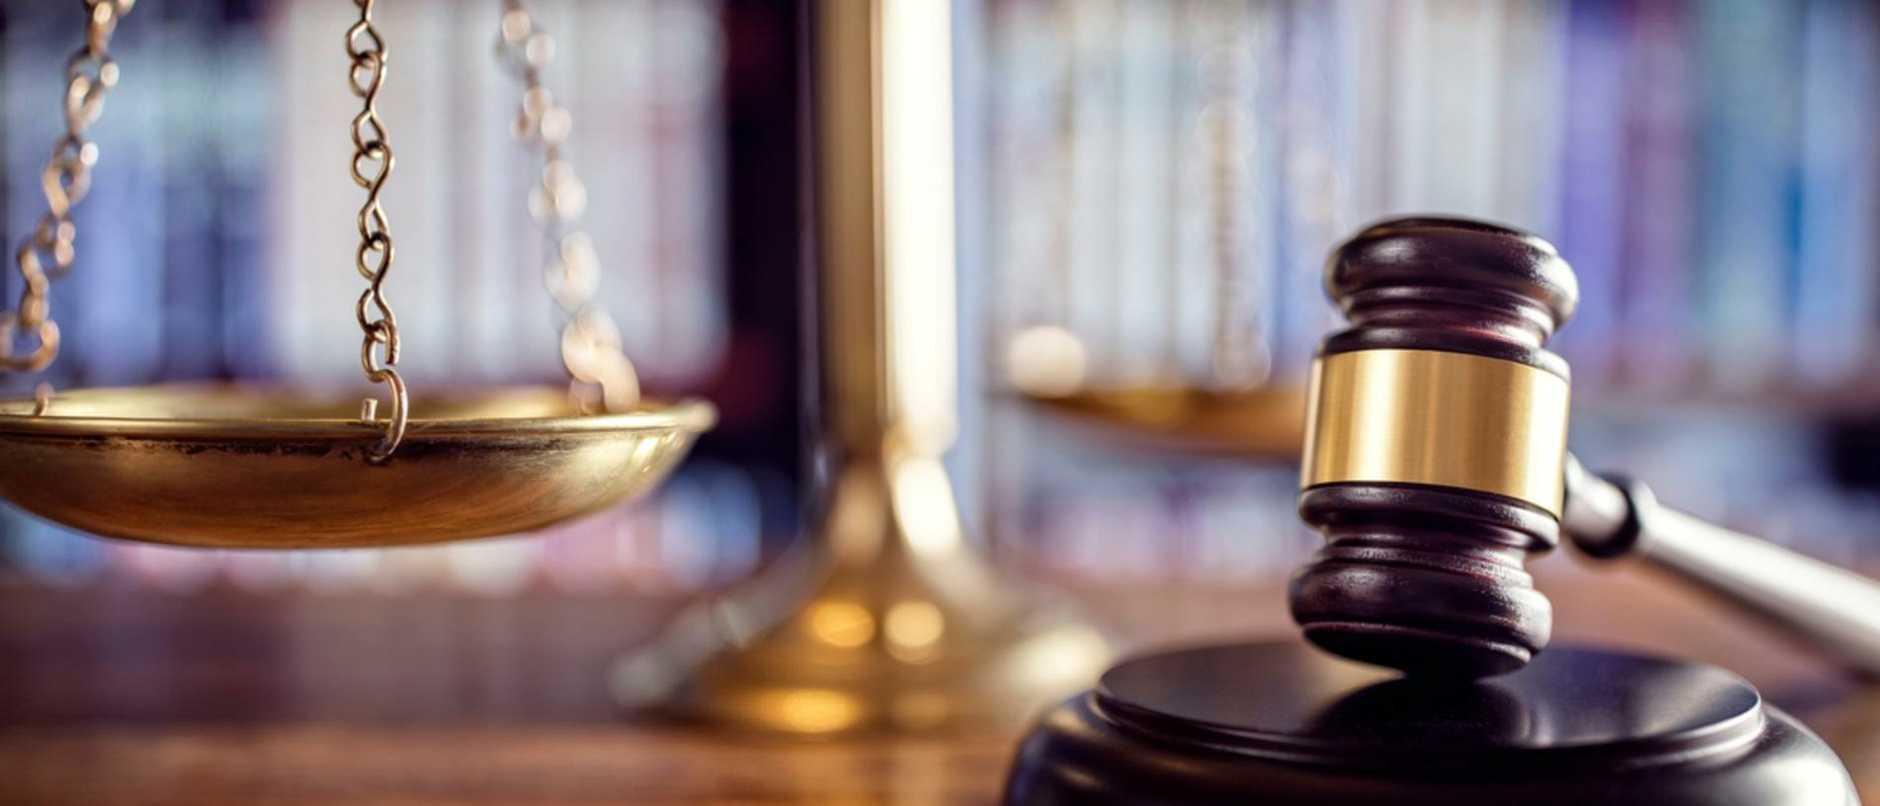 District Court criminal sittings at Brisbane, December 15